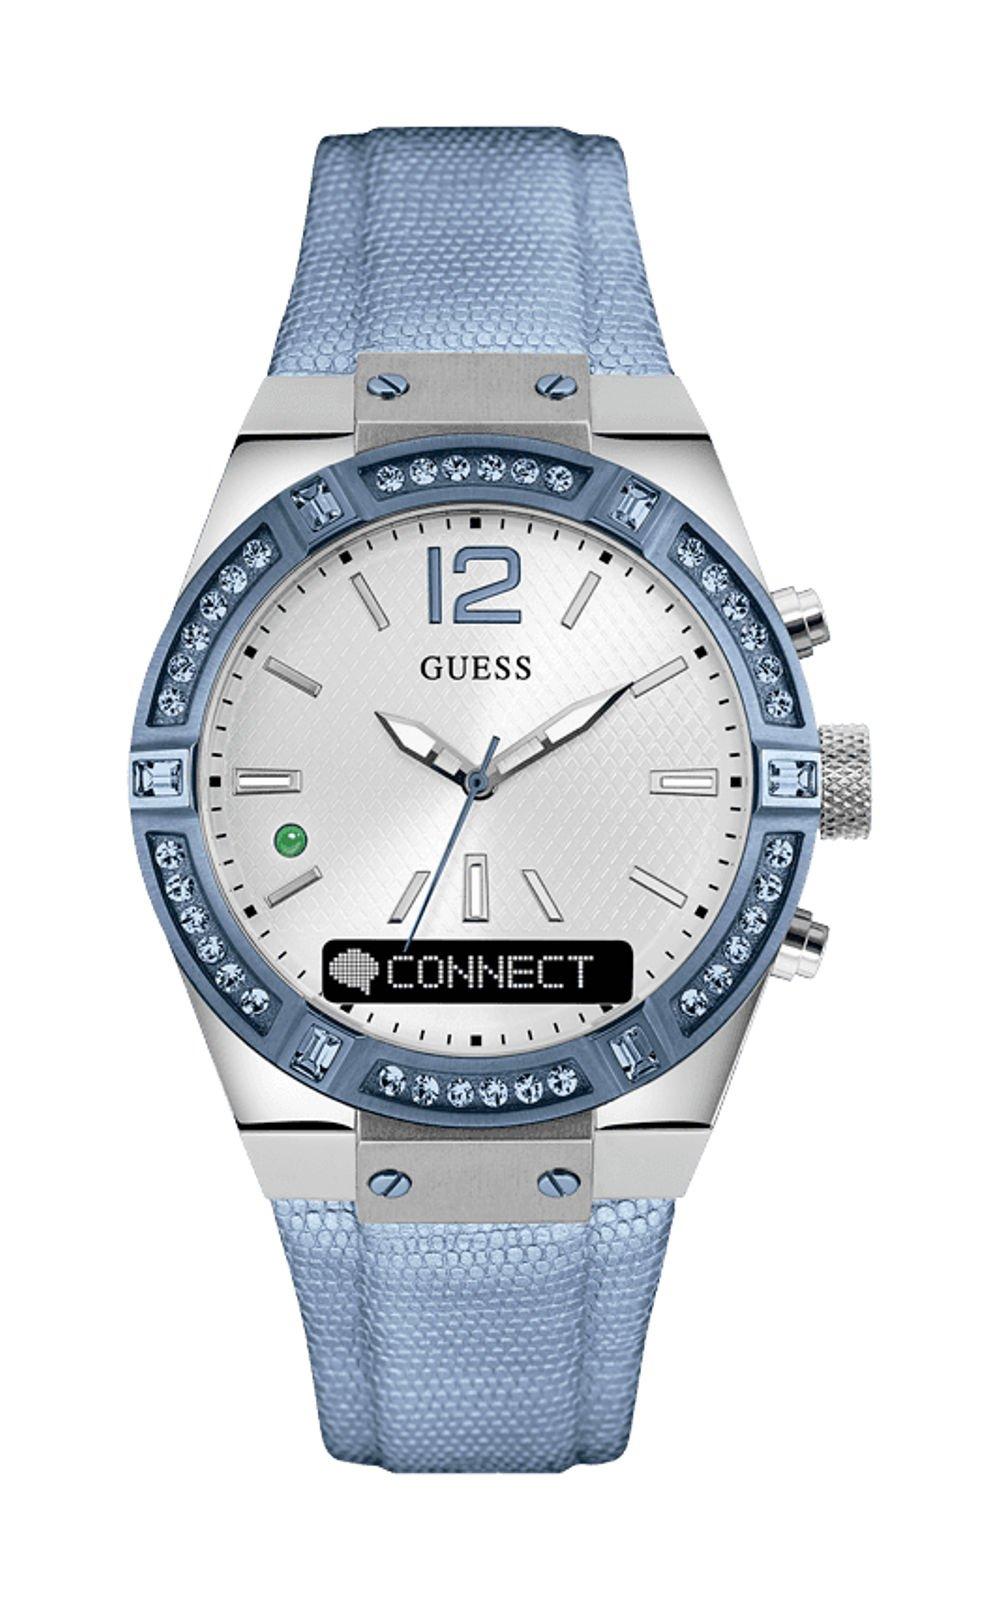 Guess-Connect-C0002M5-Γυναικείο-Ρολόι-Smartwatch